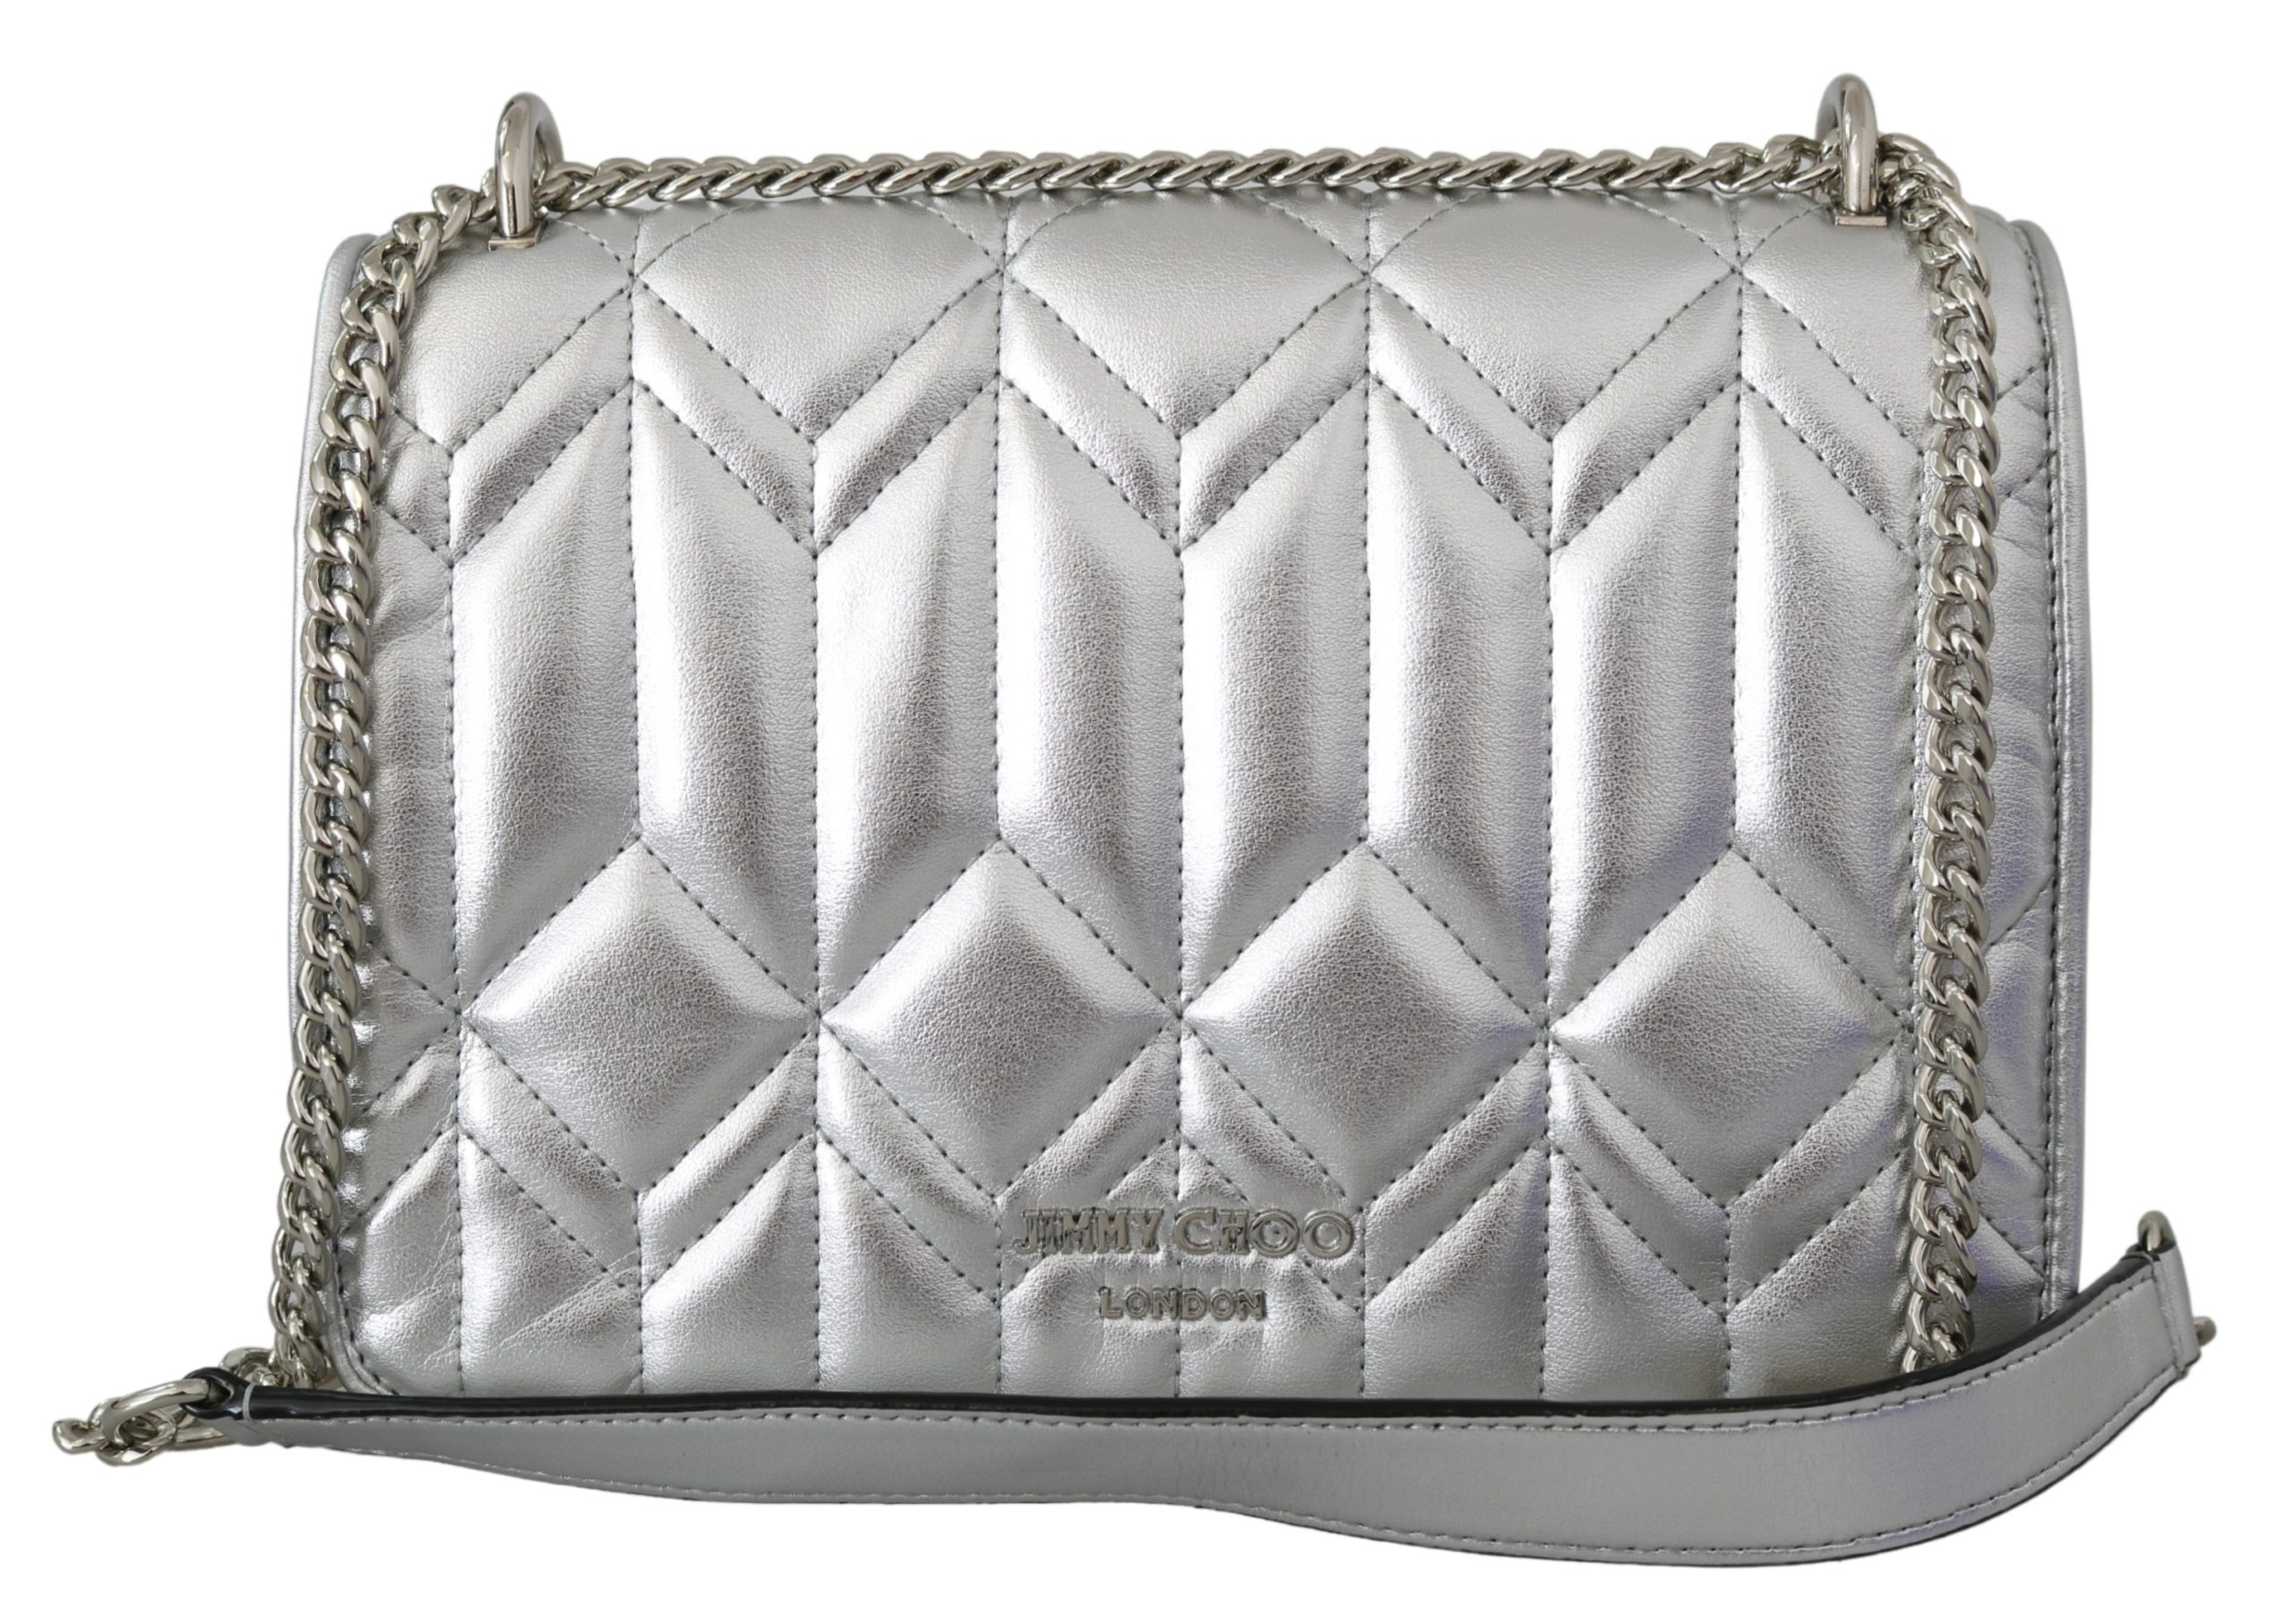 Jimmy Choo Women's Diondra Shoulder Bag Silver 1436155